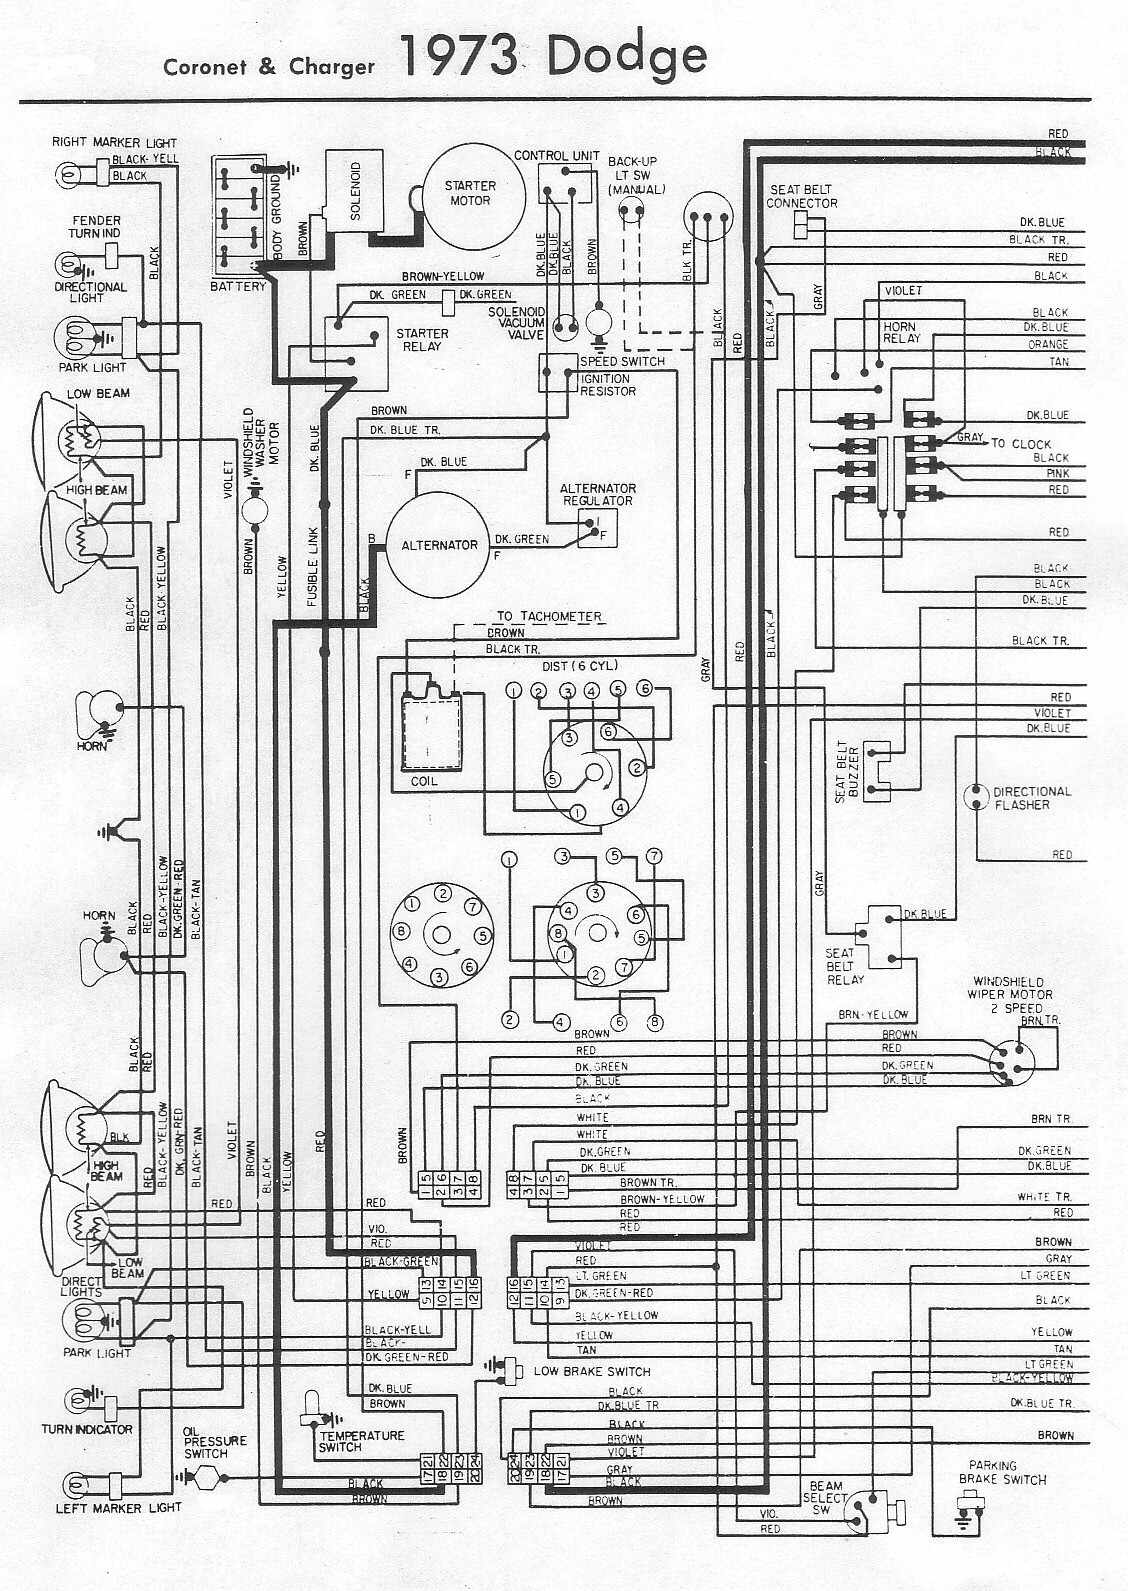 electrical wiring diagram of 1973 dodge coronet and charger?t\=1508404771 1973 dodge dart wiring diagram 1973 dodge dart instrument panel Dodge Dakota Engine Diagram at bayanpartner.co